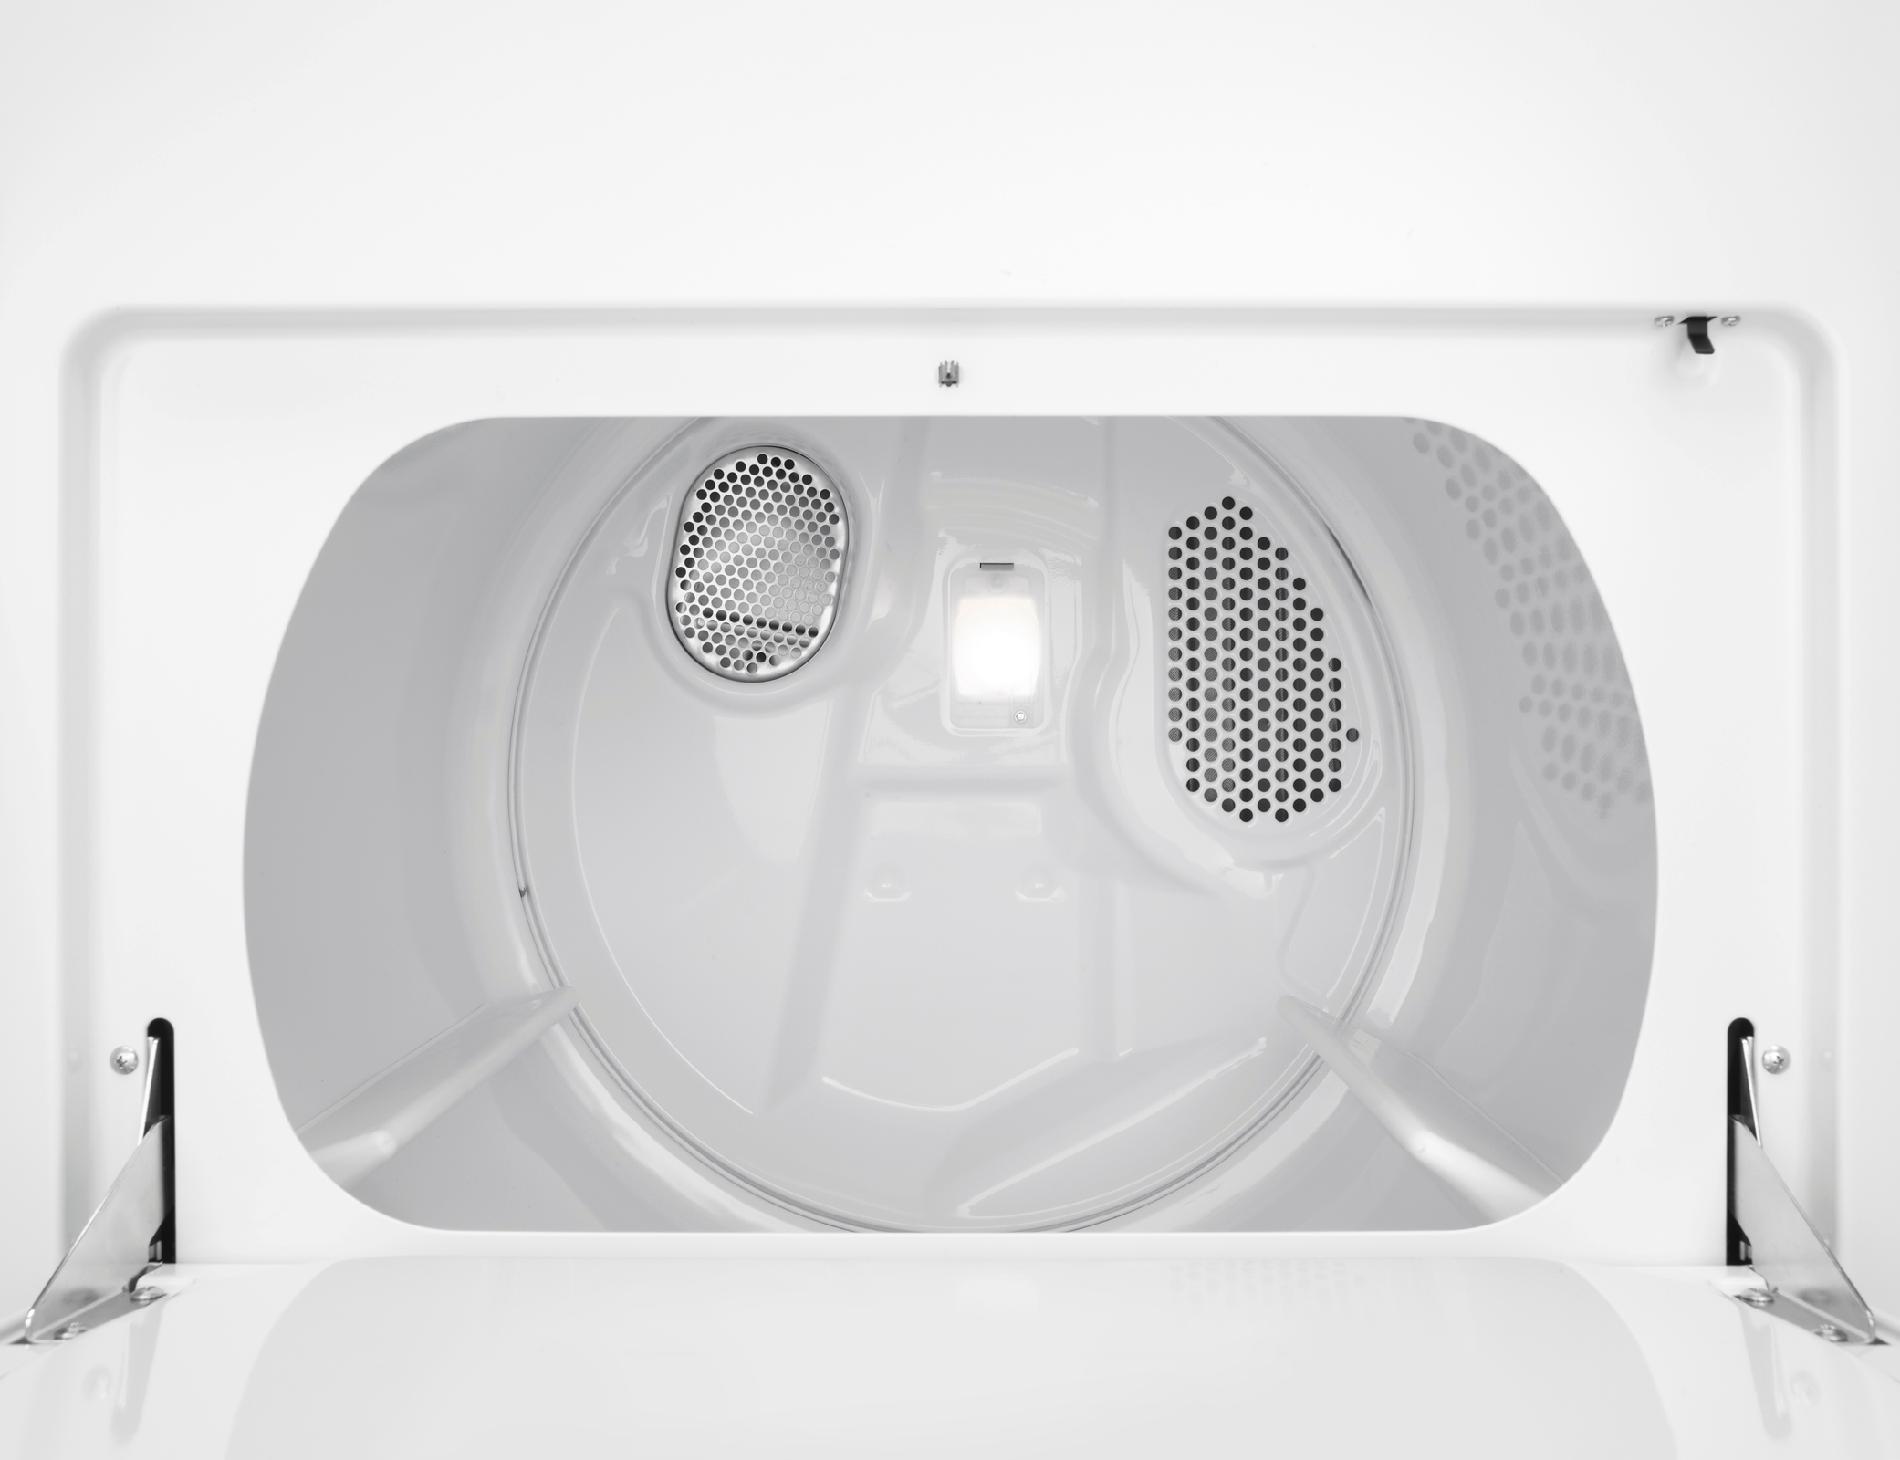 Whirlpool 6.4 cu. ft. Flat Back Electric Dryer w/ Wrinkle Shield™ Option - White